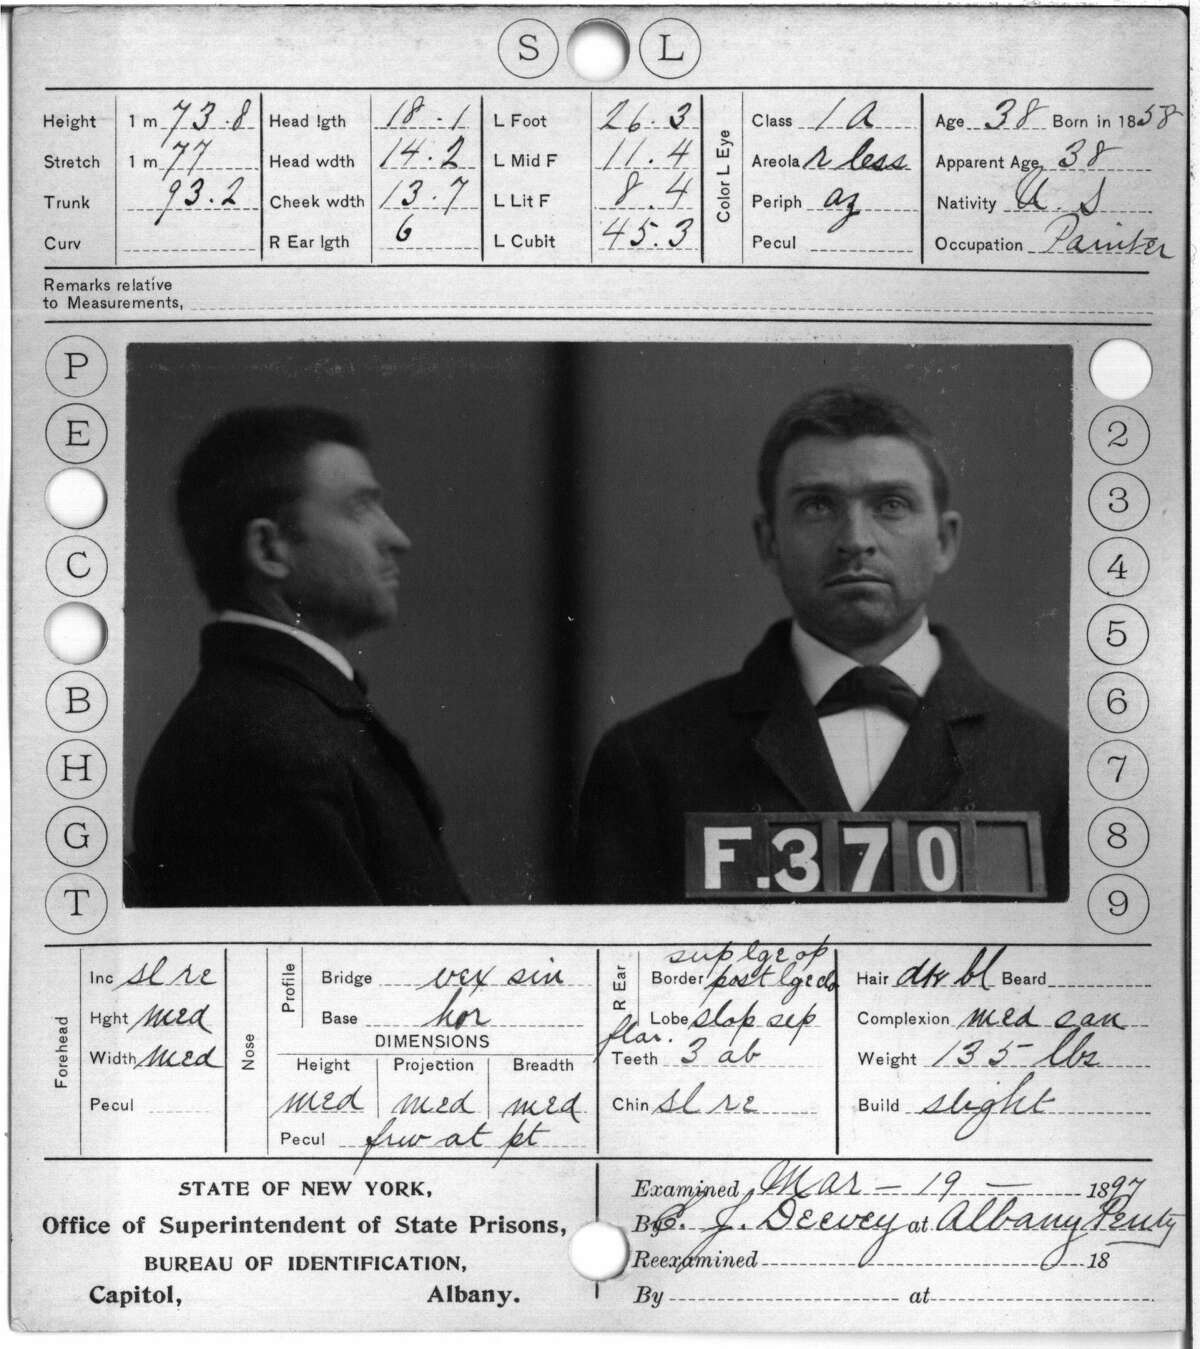 John J. Baker, Albany County Penitentiary. Crime: vagrant. Term:150 days.(Albany County Hall of Records)